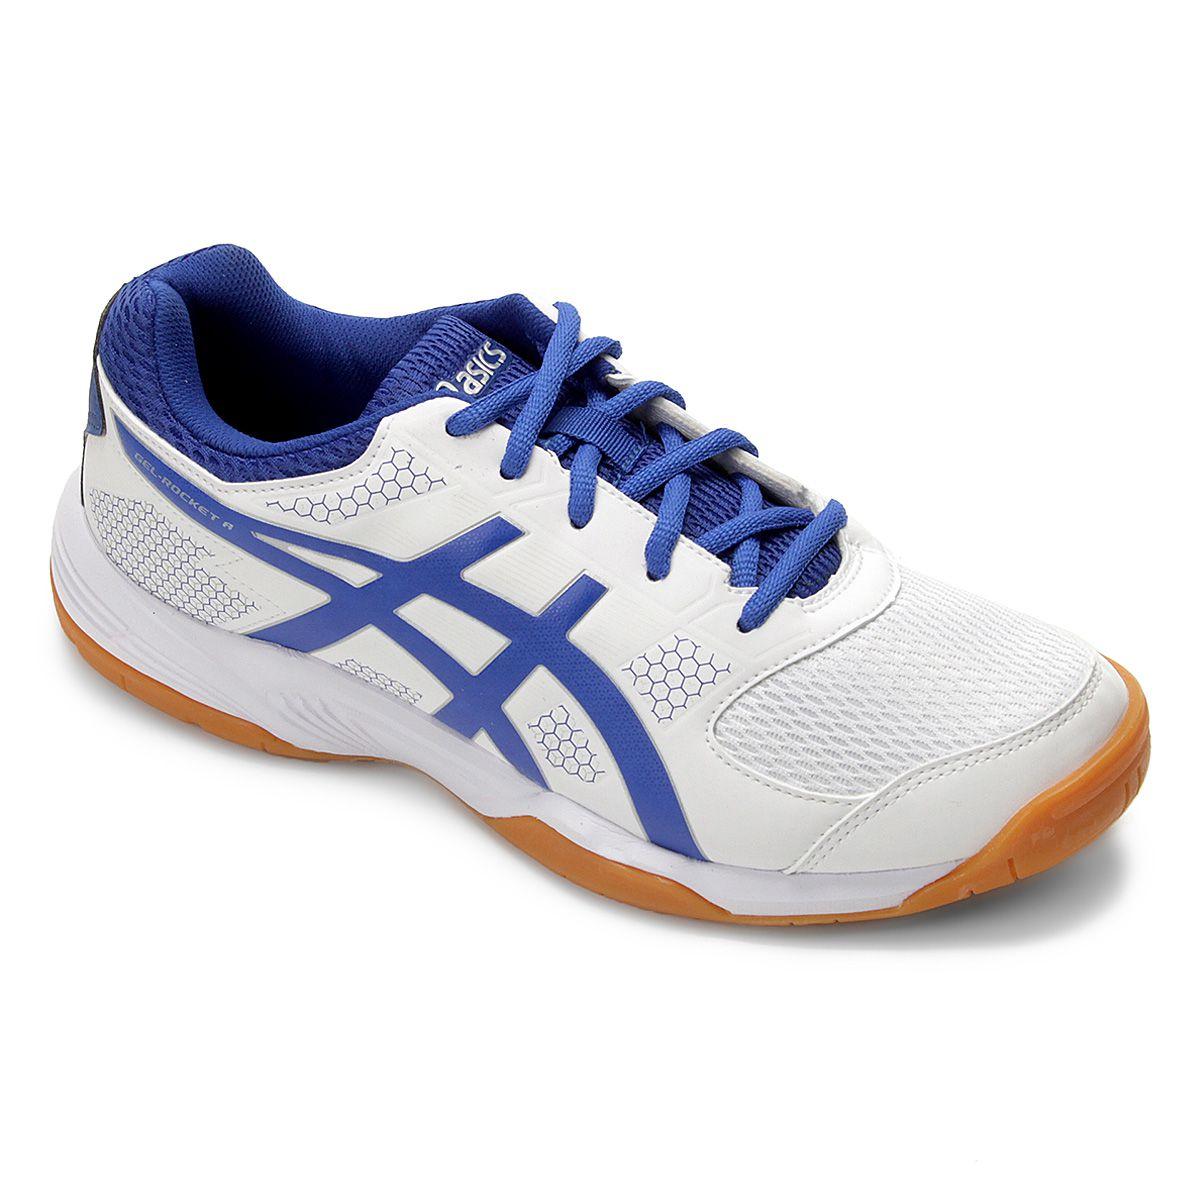 Tênis Asics Gel Rocket 8 A P/ Vôlei Squash Tênis Futsal Branco  - REAL ESPORTE